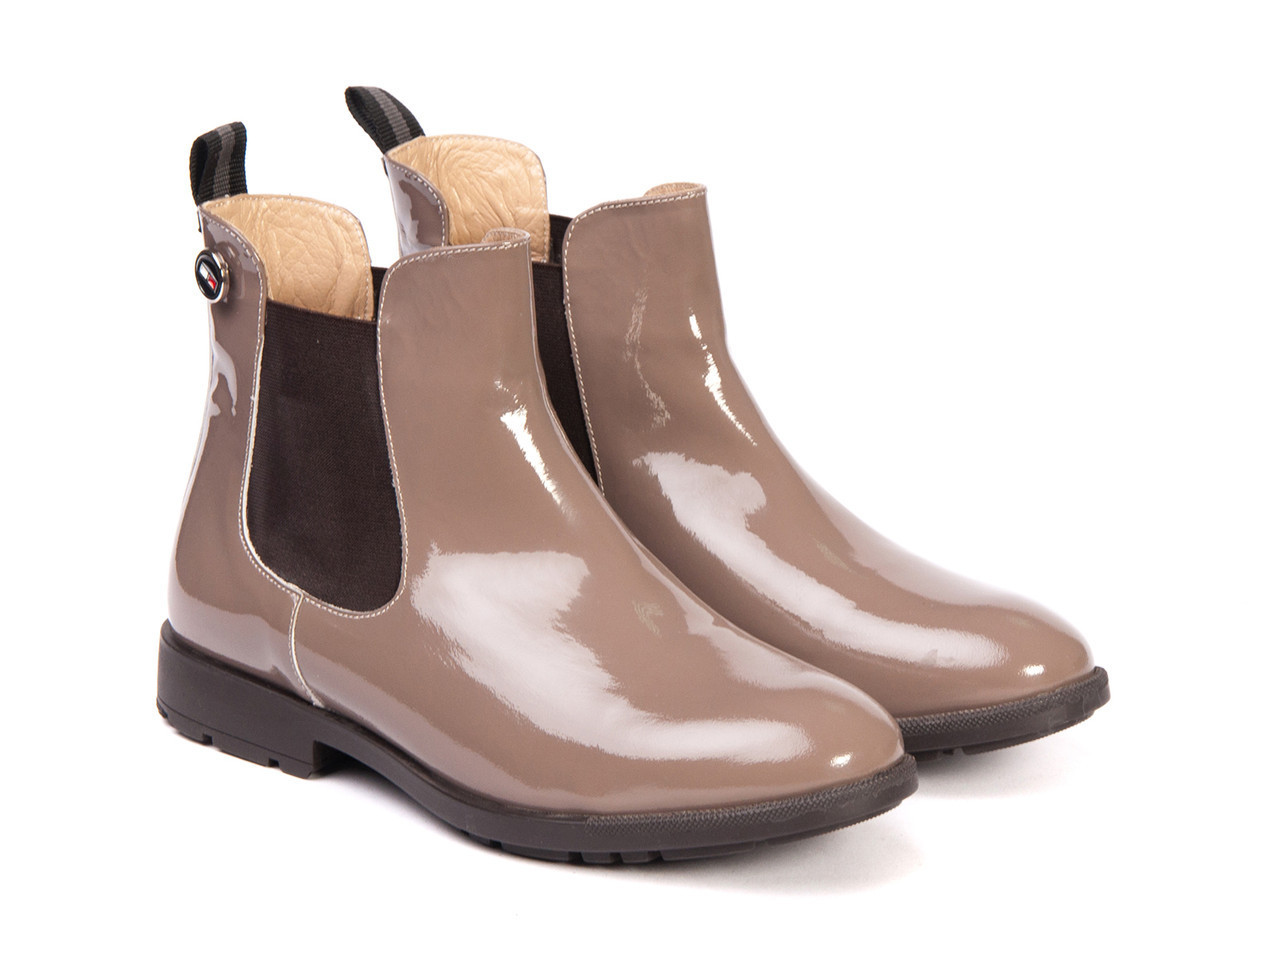 Ботинки Etor 4269-0-7134-1405 39 бежевые